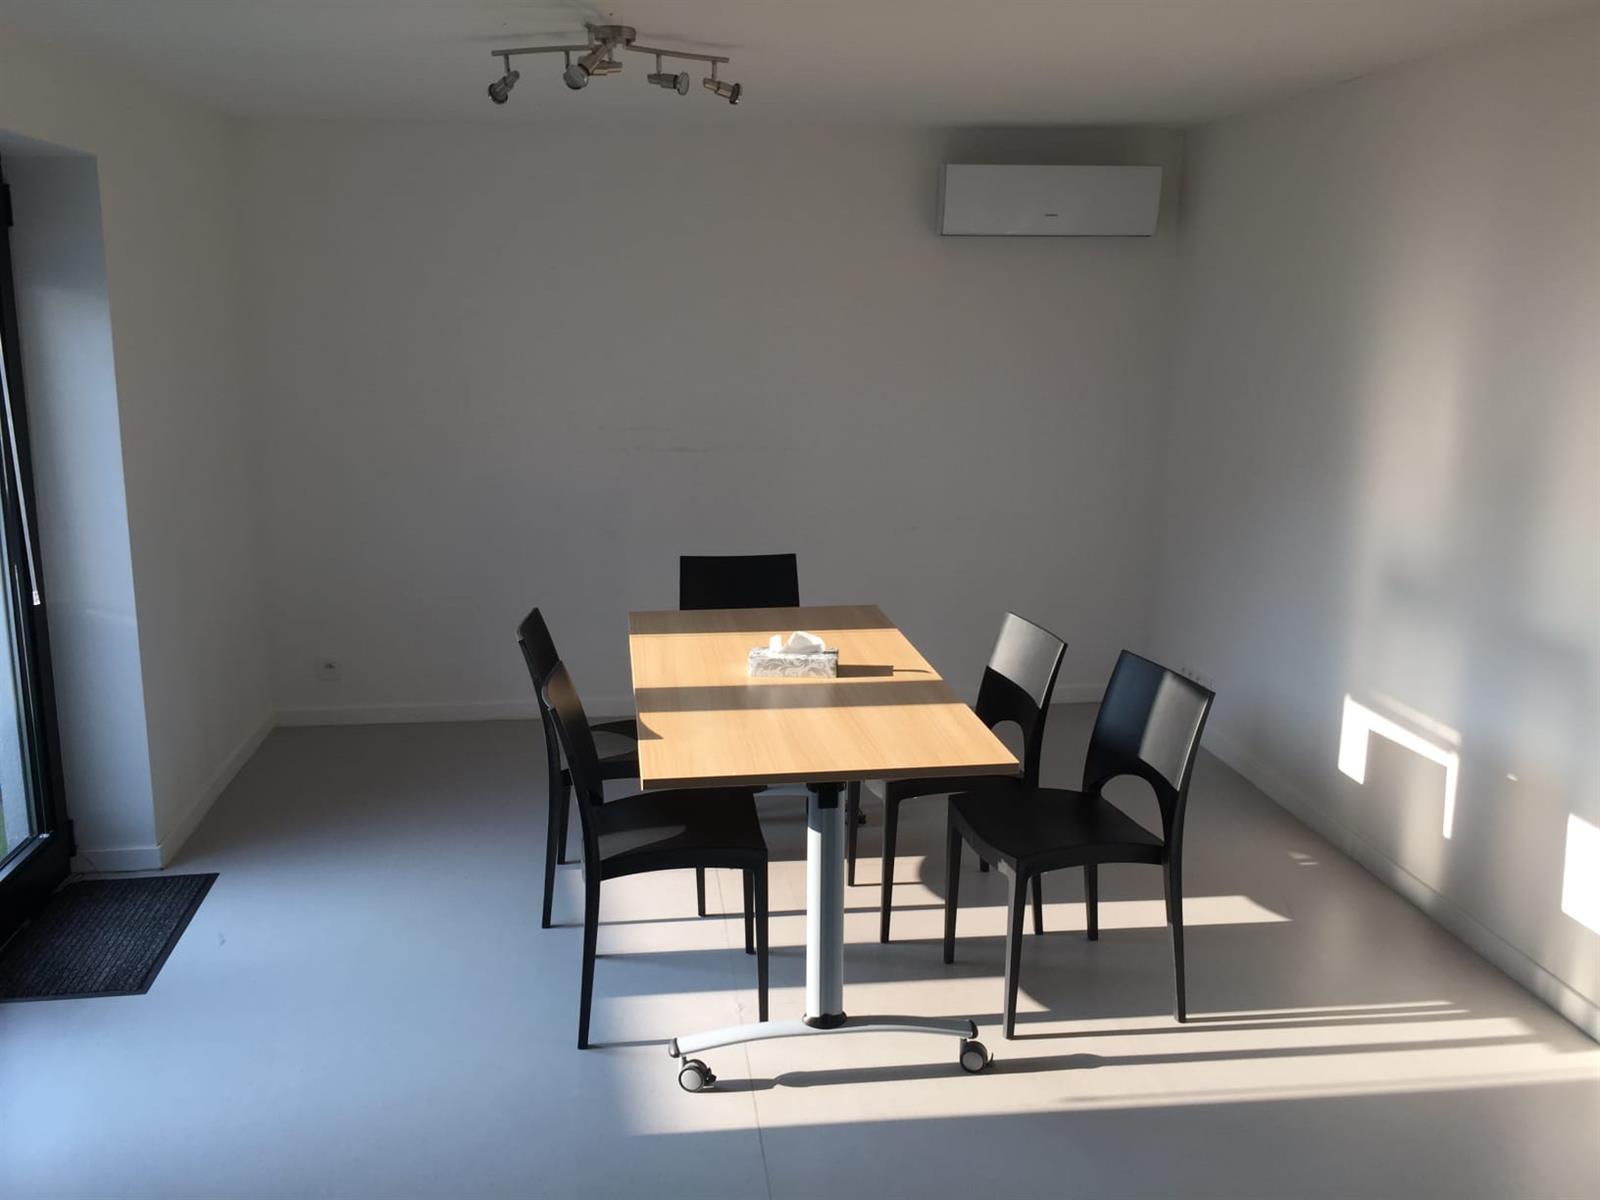 kantoor te huur K003 - Middelmolenlaan 96, 2100 Antwerpen Deurne, België 12